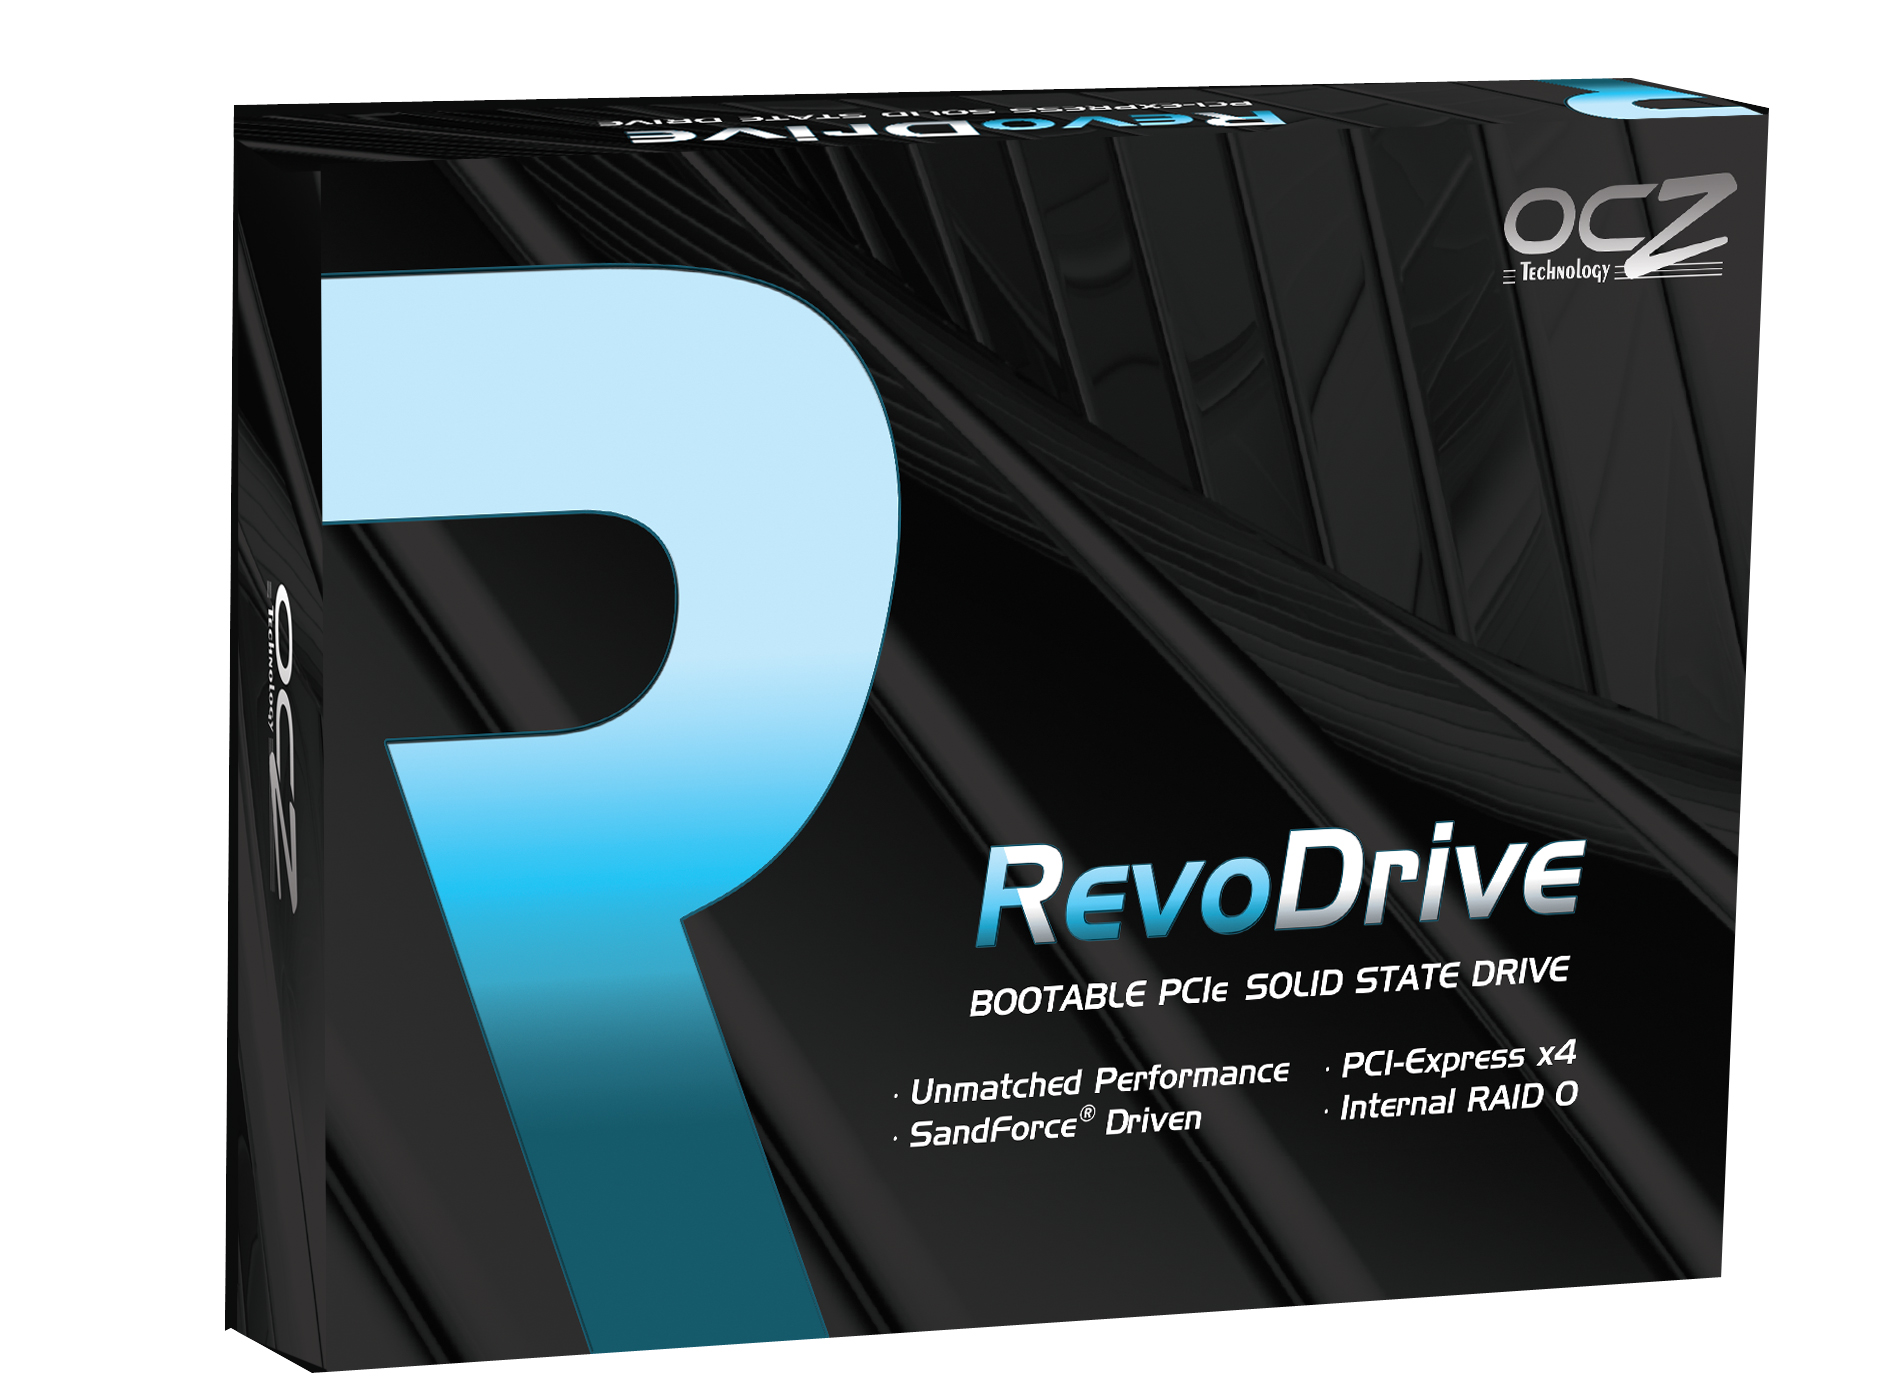 Ssd 180 gb pci-ex4 ocz revo drive pci-express oczssdpx-1rvd0180 mlc